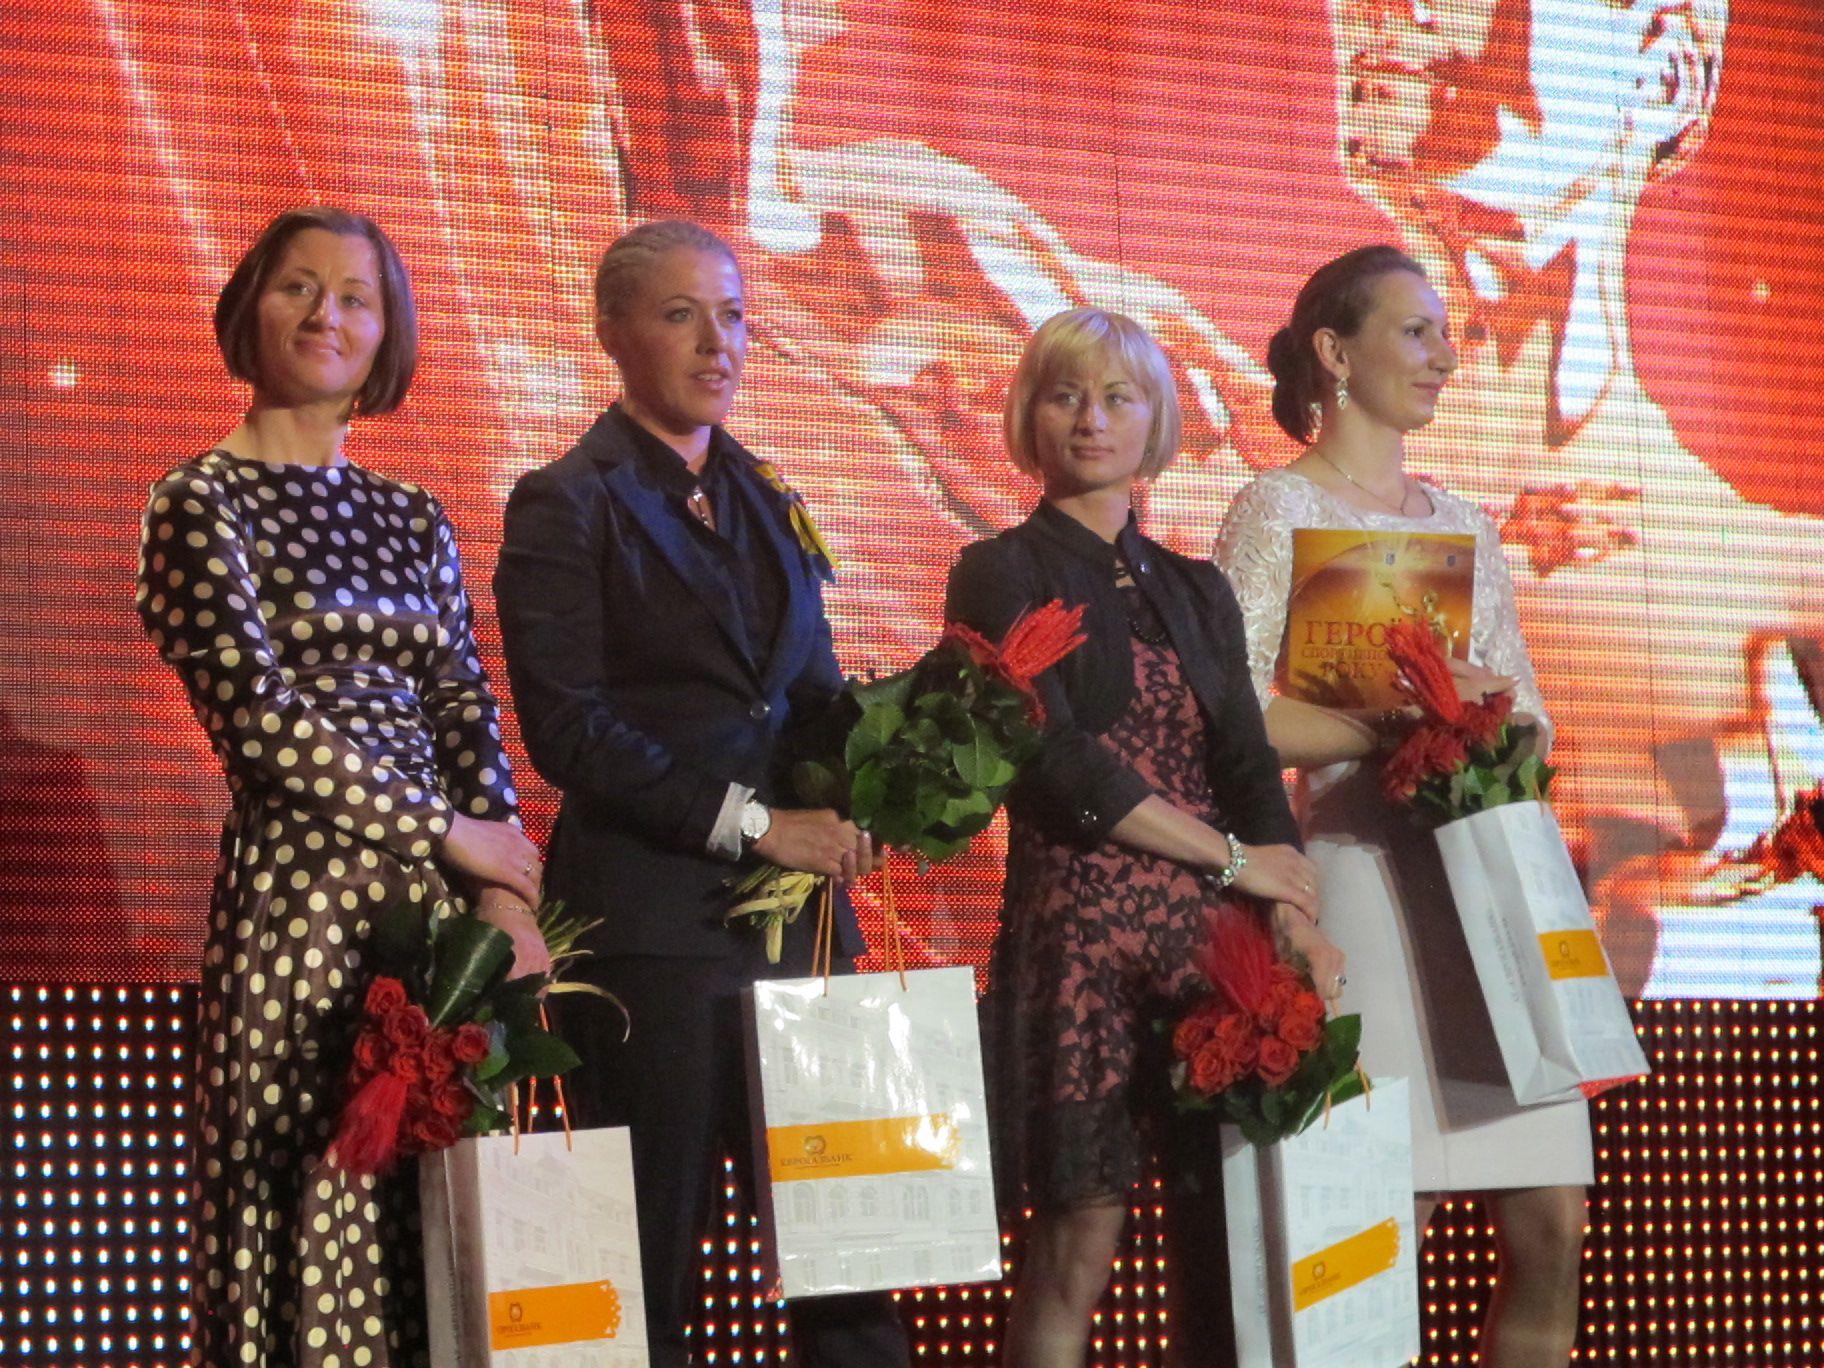 Вита Семеренко, Юлия Джима, Валя Семеренко и Елена Пидгрушная